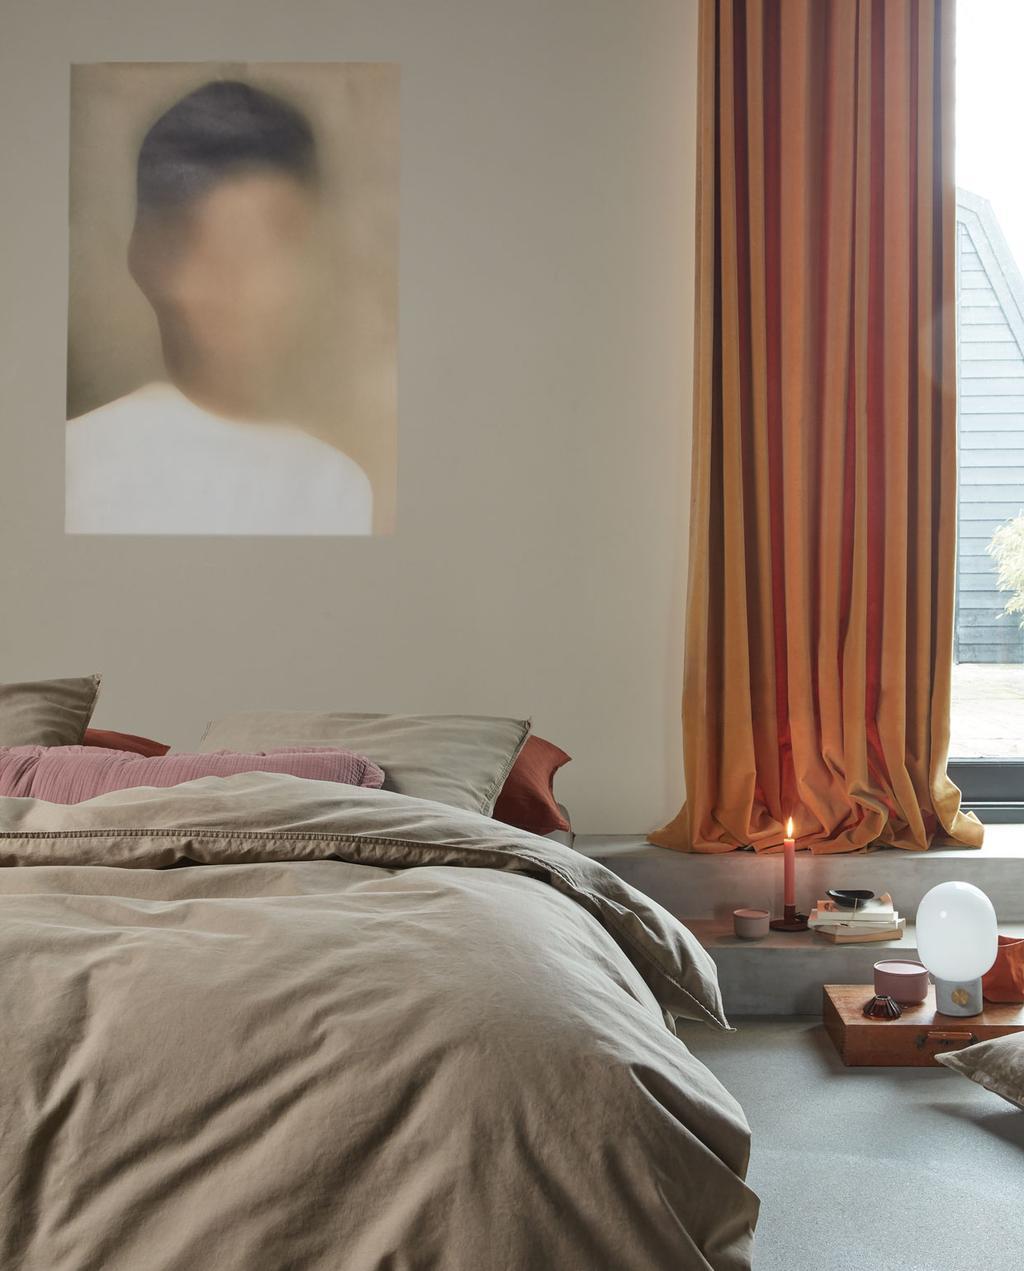 vtwonen 10-2019 | slaapkamer nude linnen natural stone bedlinnen